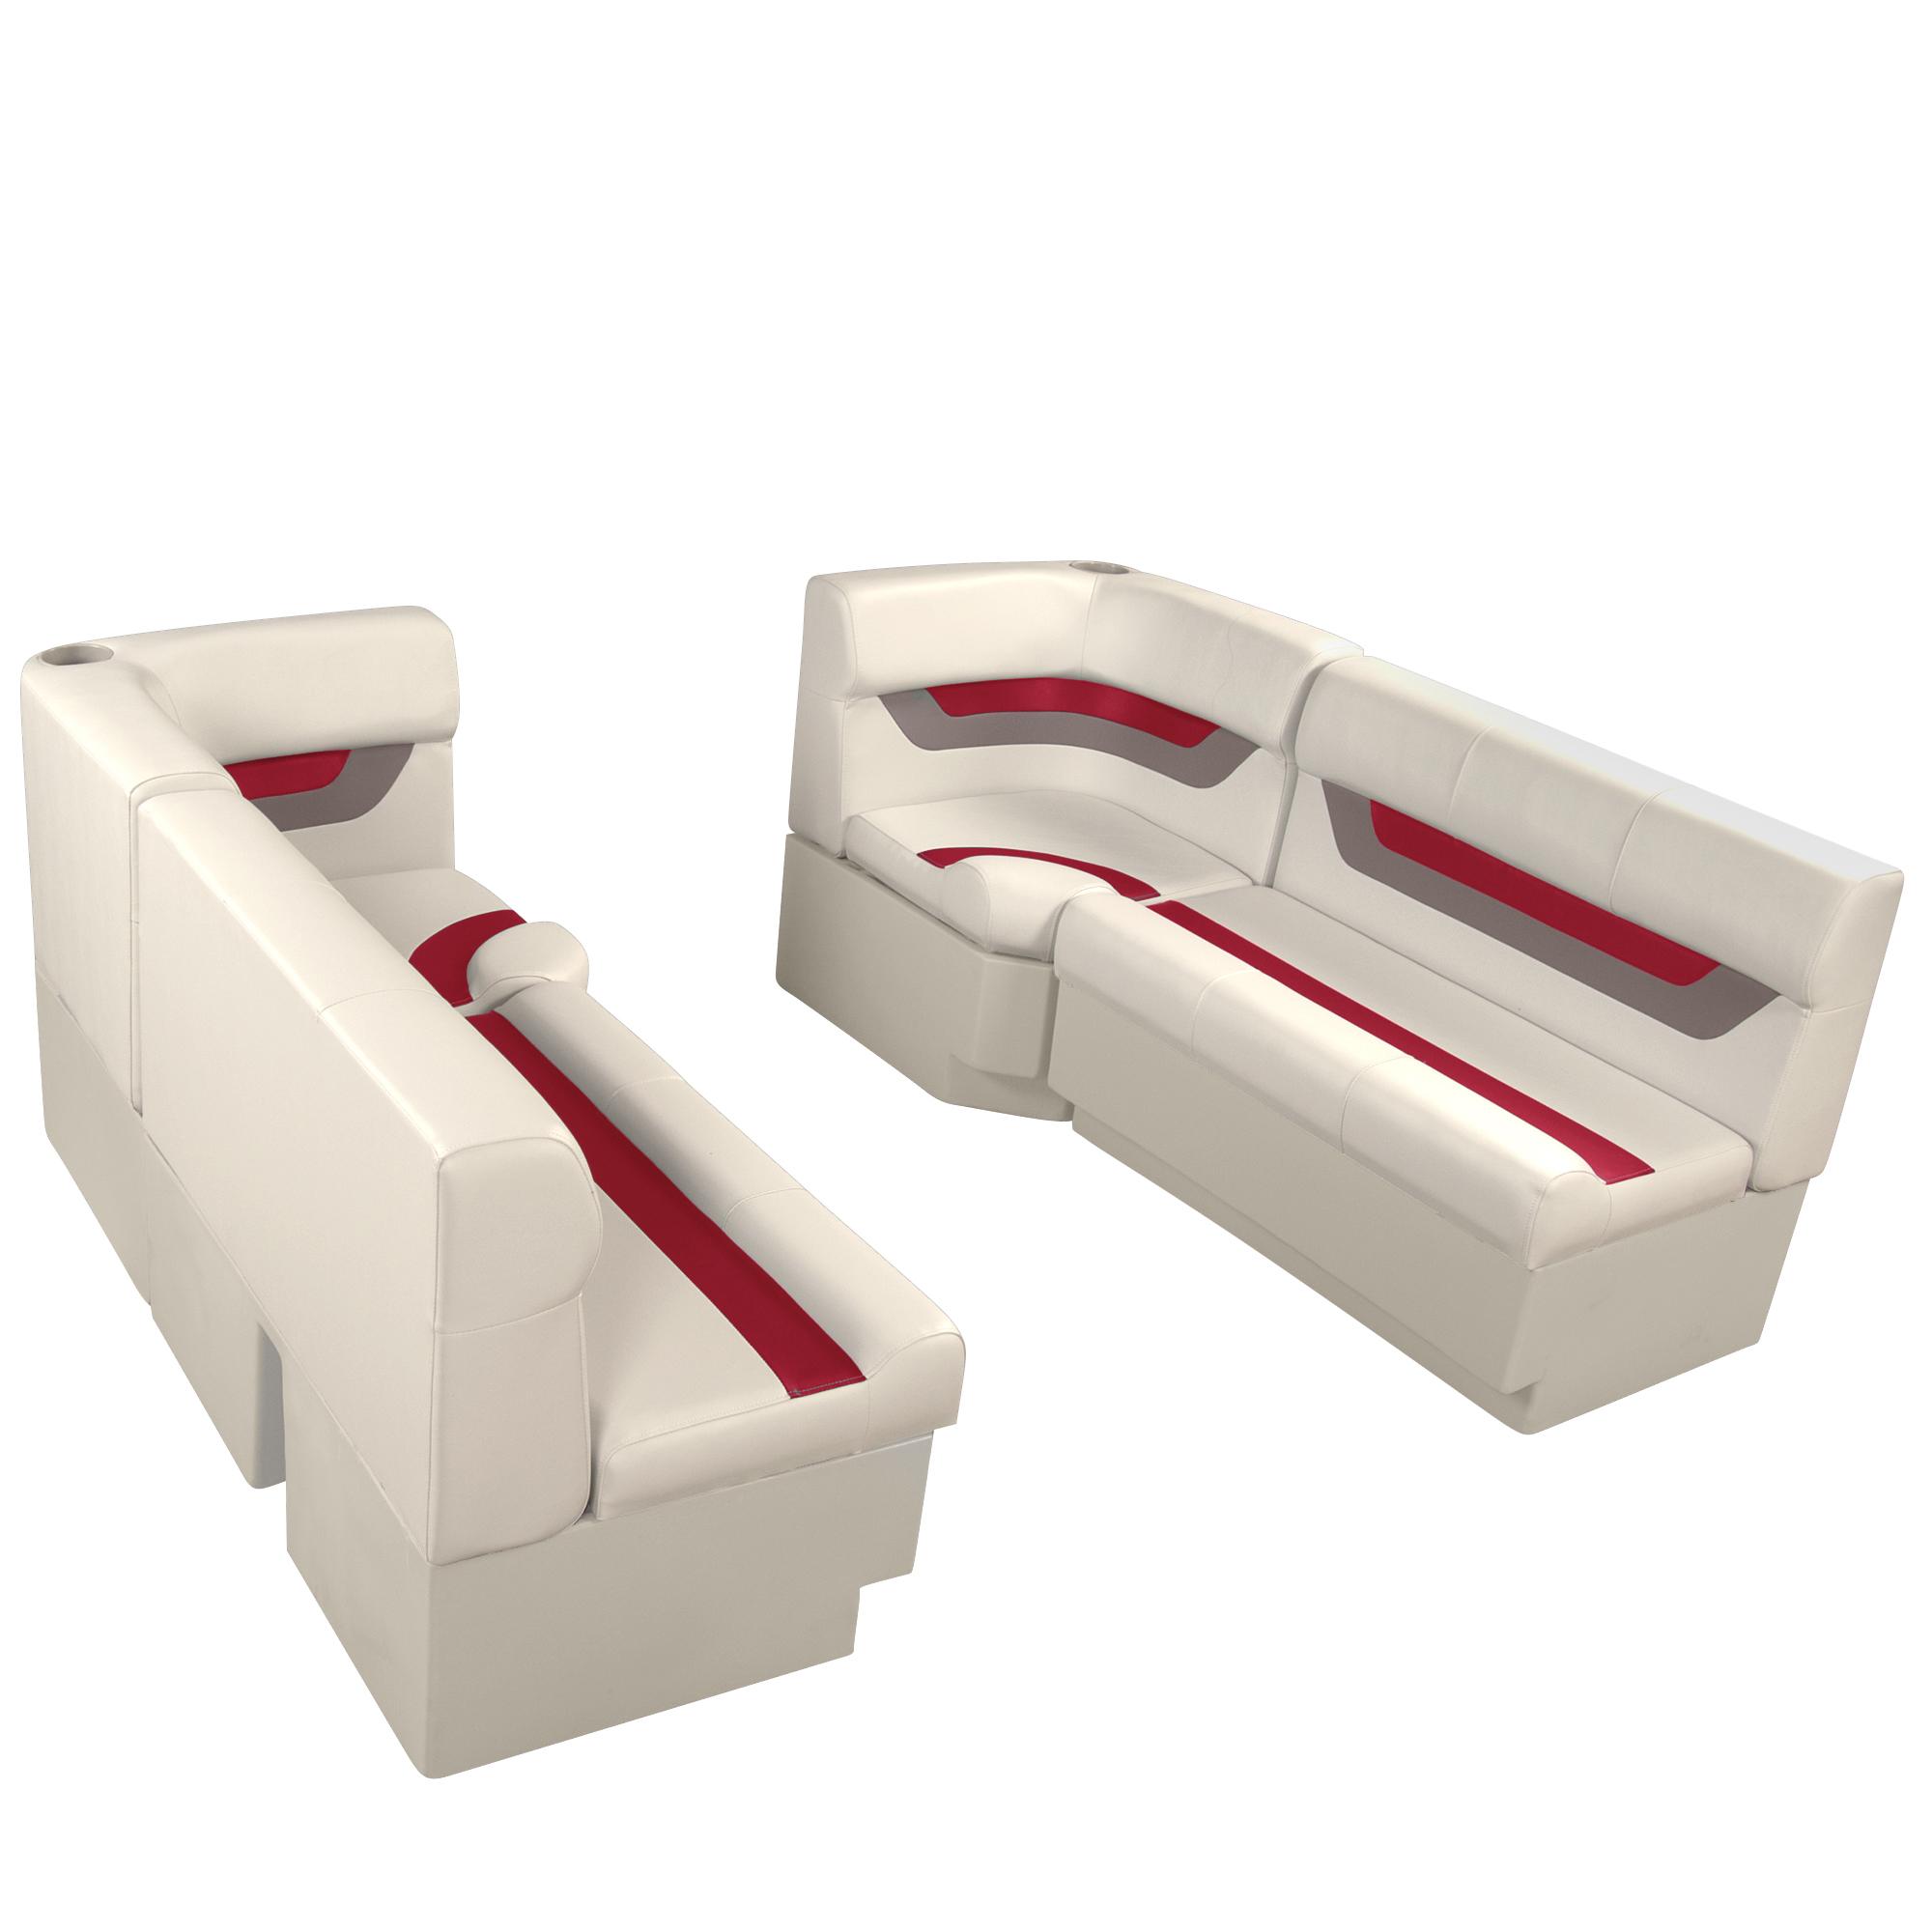 "Designer Pontoon Furniture - 61"" Front Seat Package, Platinum/Dark Red/Mocha"